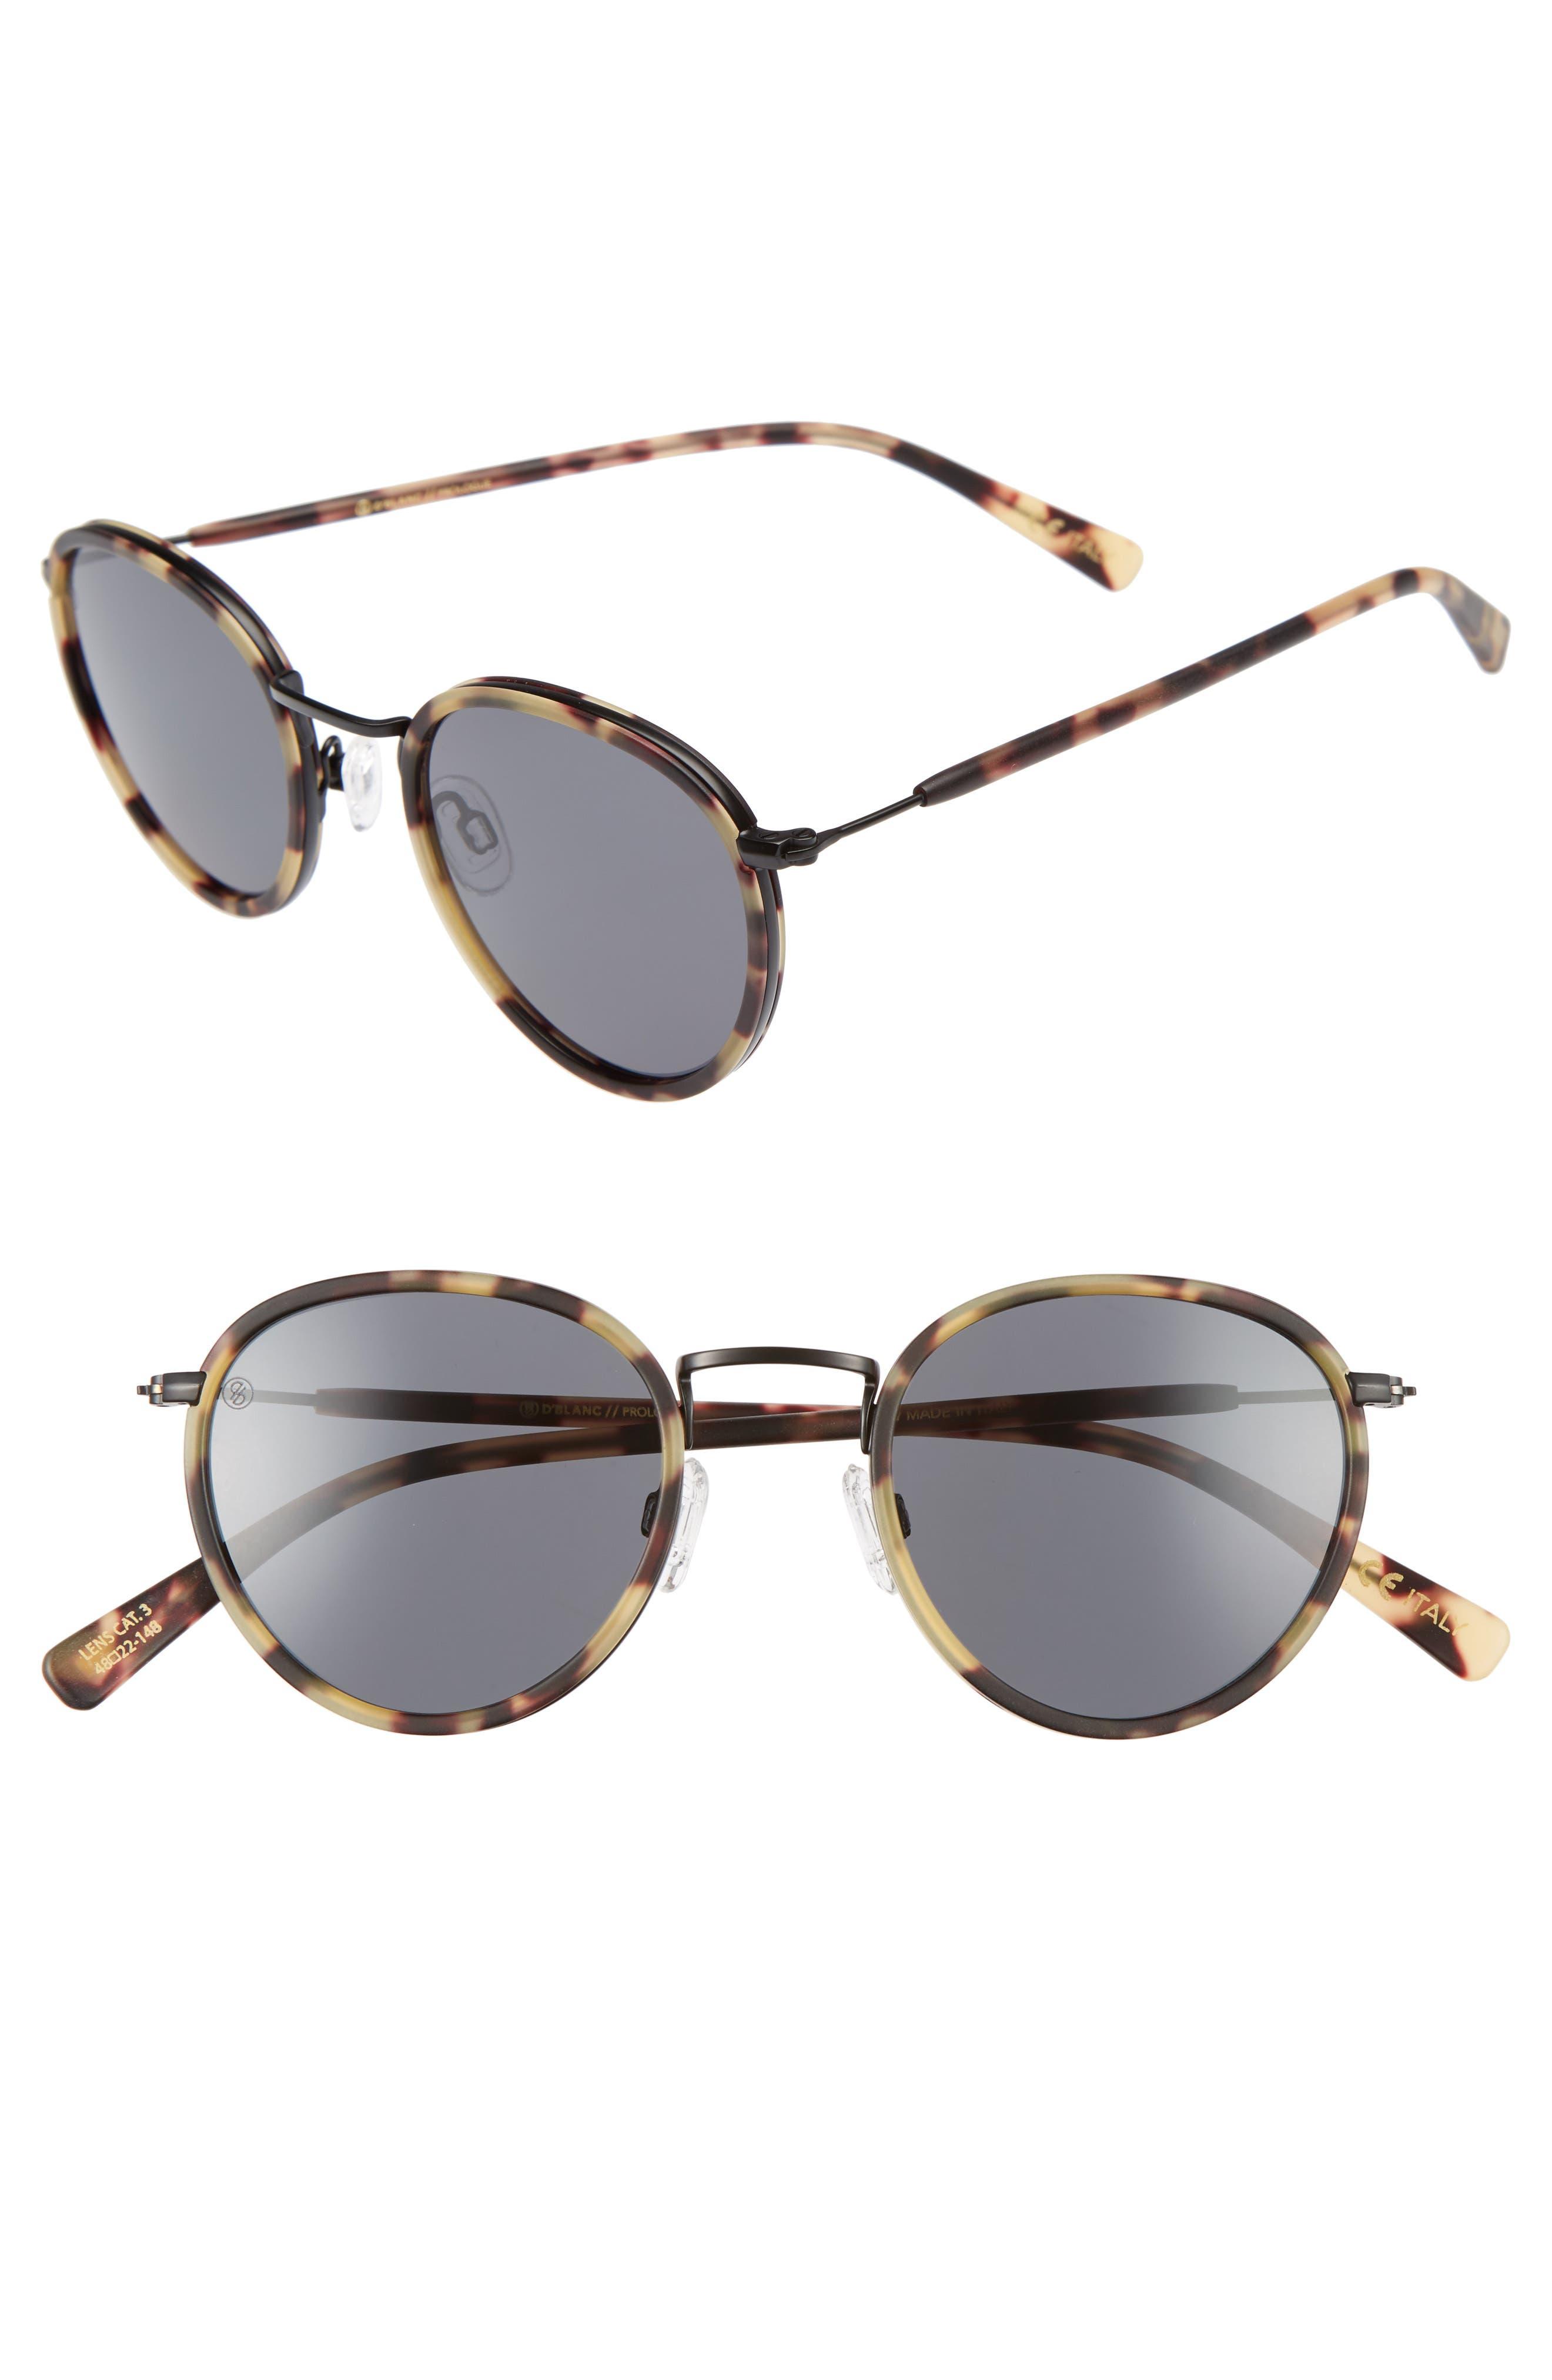 D'BLANC Prologue 48mm Round Sunglasses